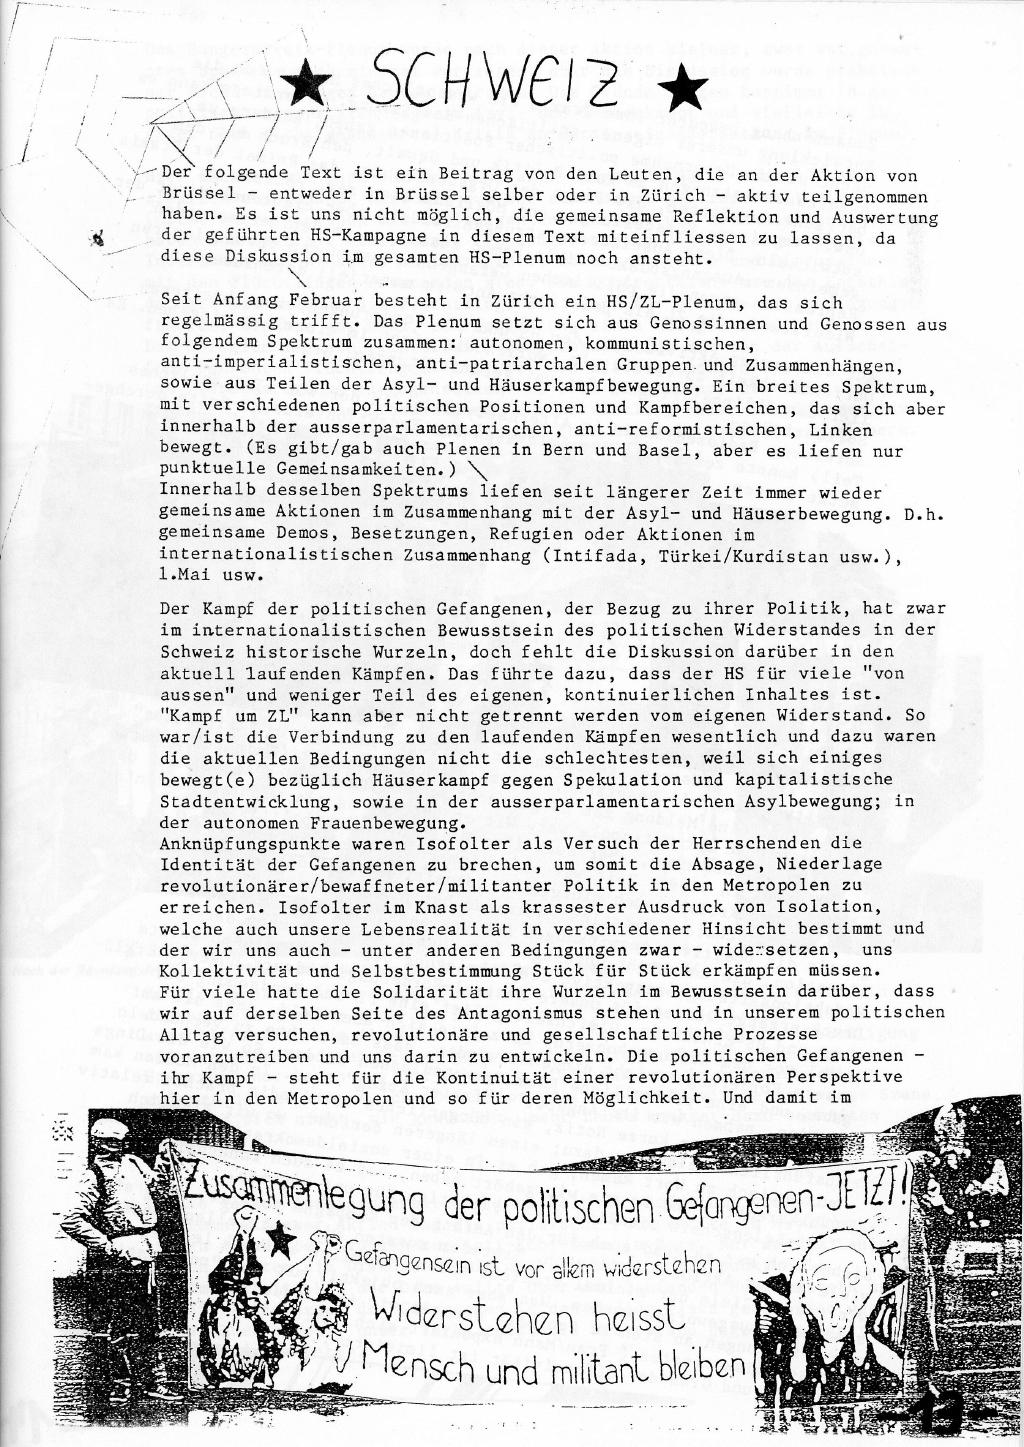 Belgien_Doku_Besetzung_EG_Kommission_1989_015